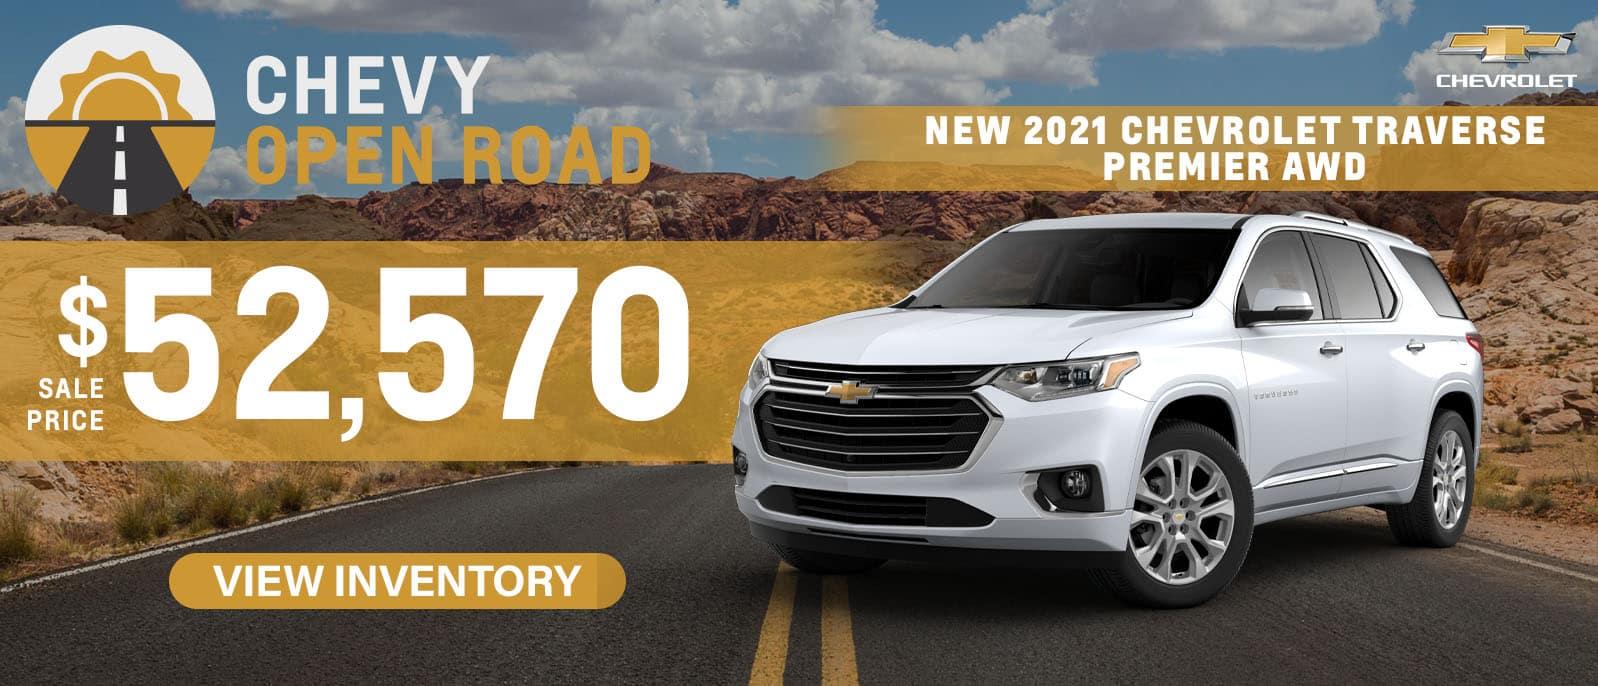 CRCH-July 2021-2021 Chevrolet Traverse copy